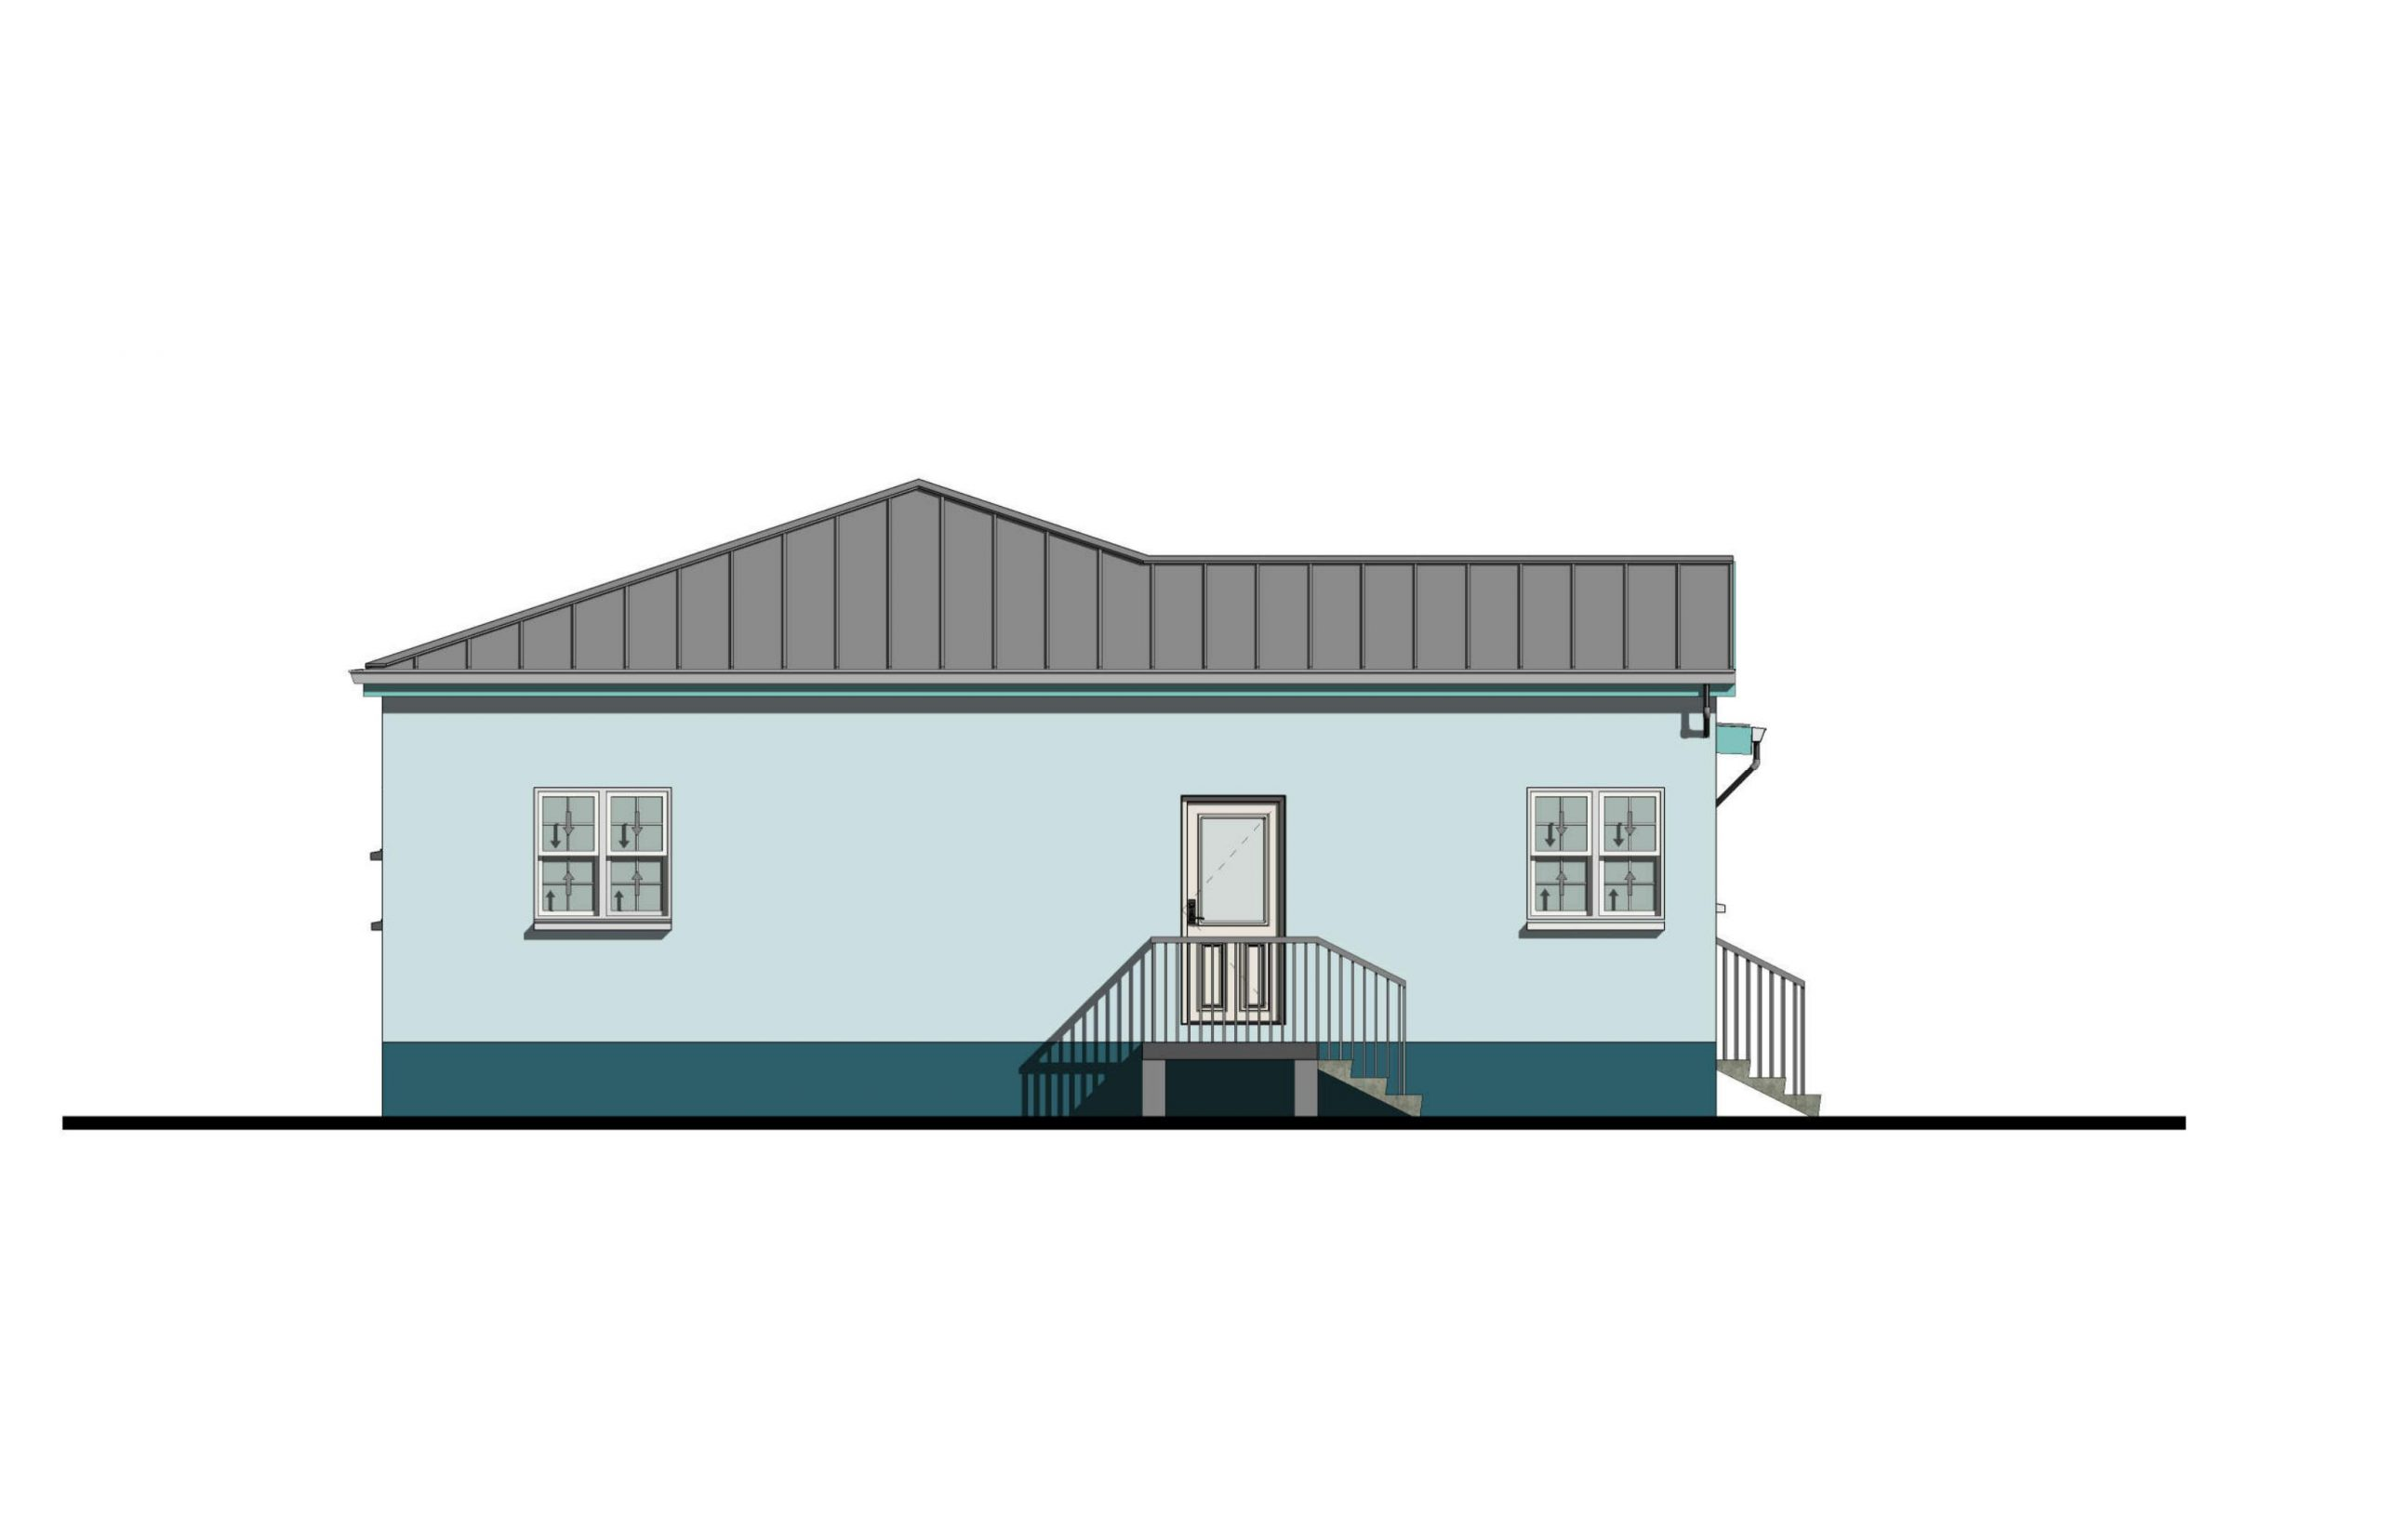 Lodestar 3 Bed  2Bath Option 1 Side Elevation A 1060+SQFT